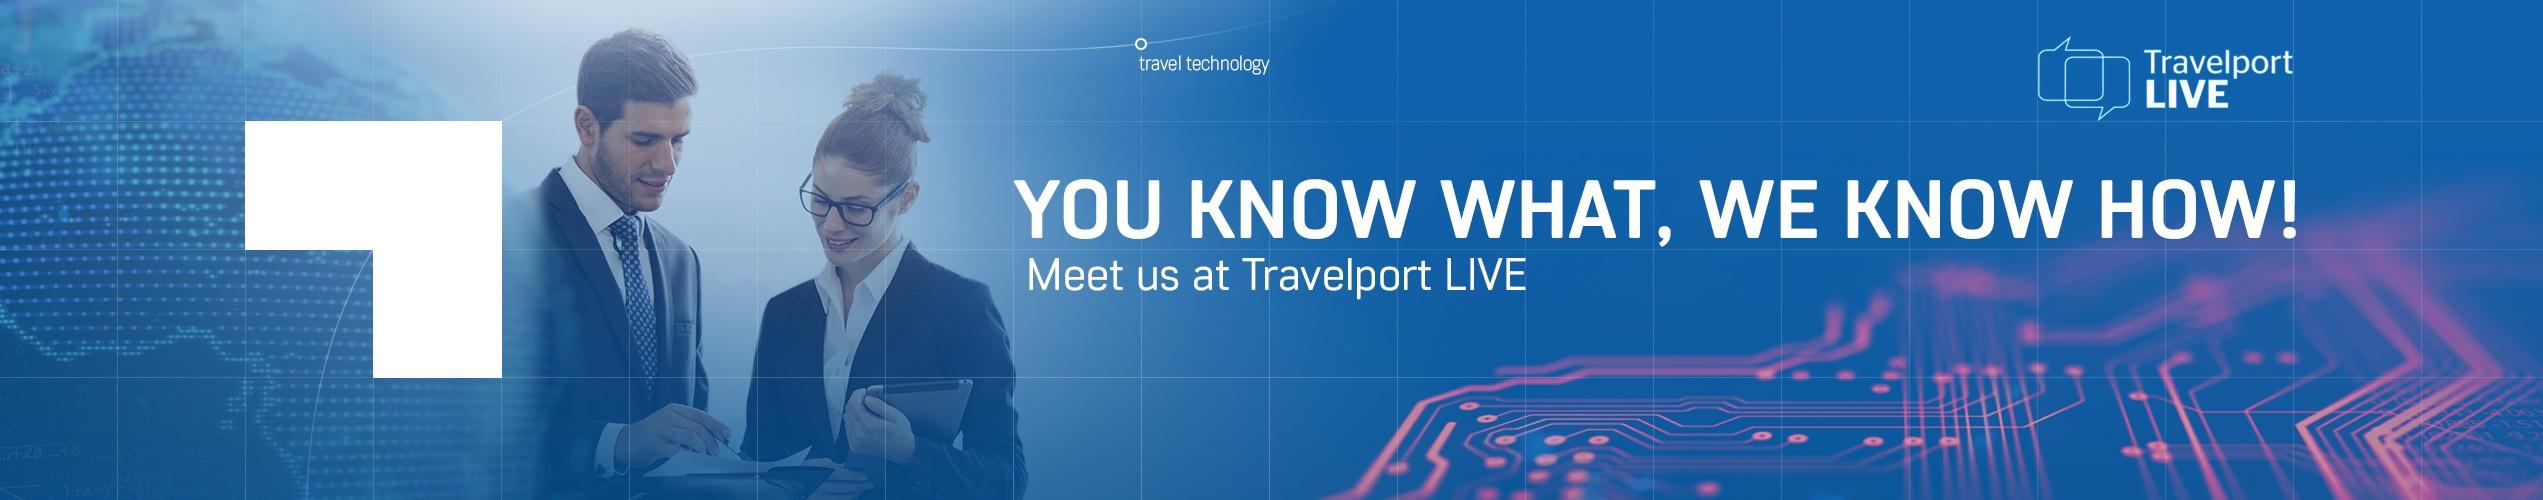 Travelport LIVE Conference